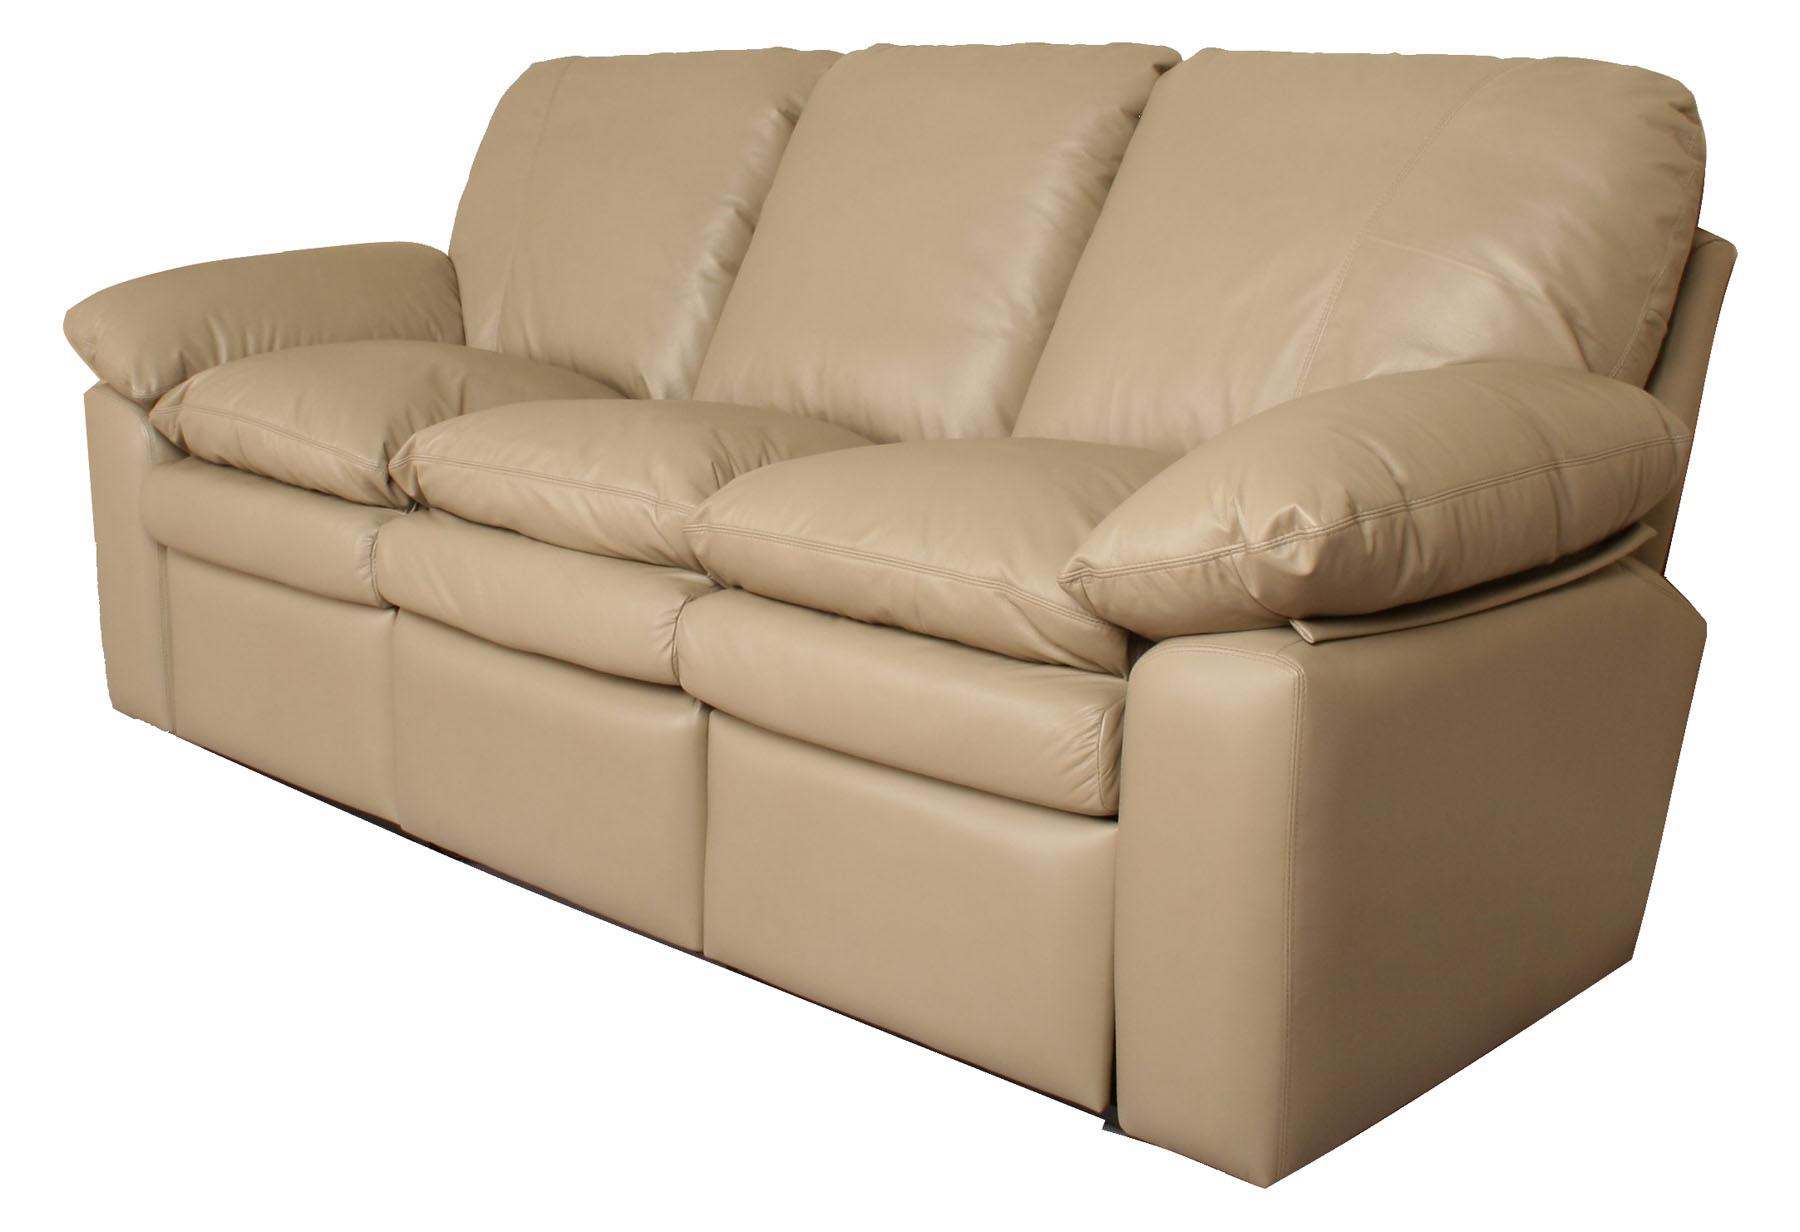 Carrera Reclining Leather Sofa